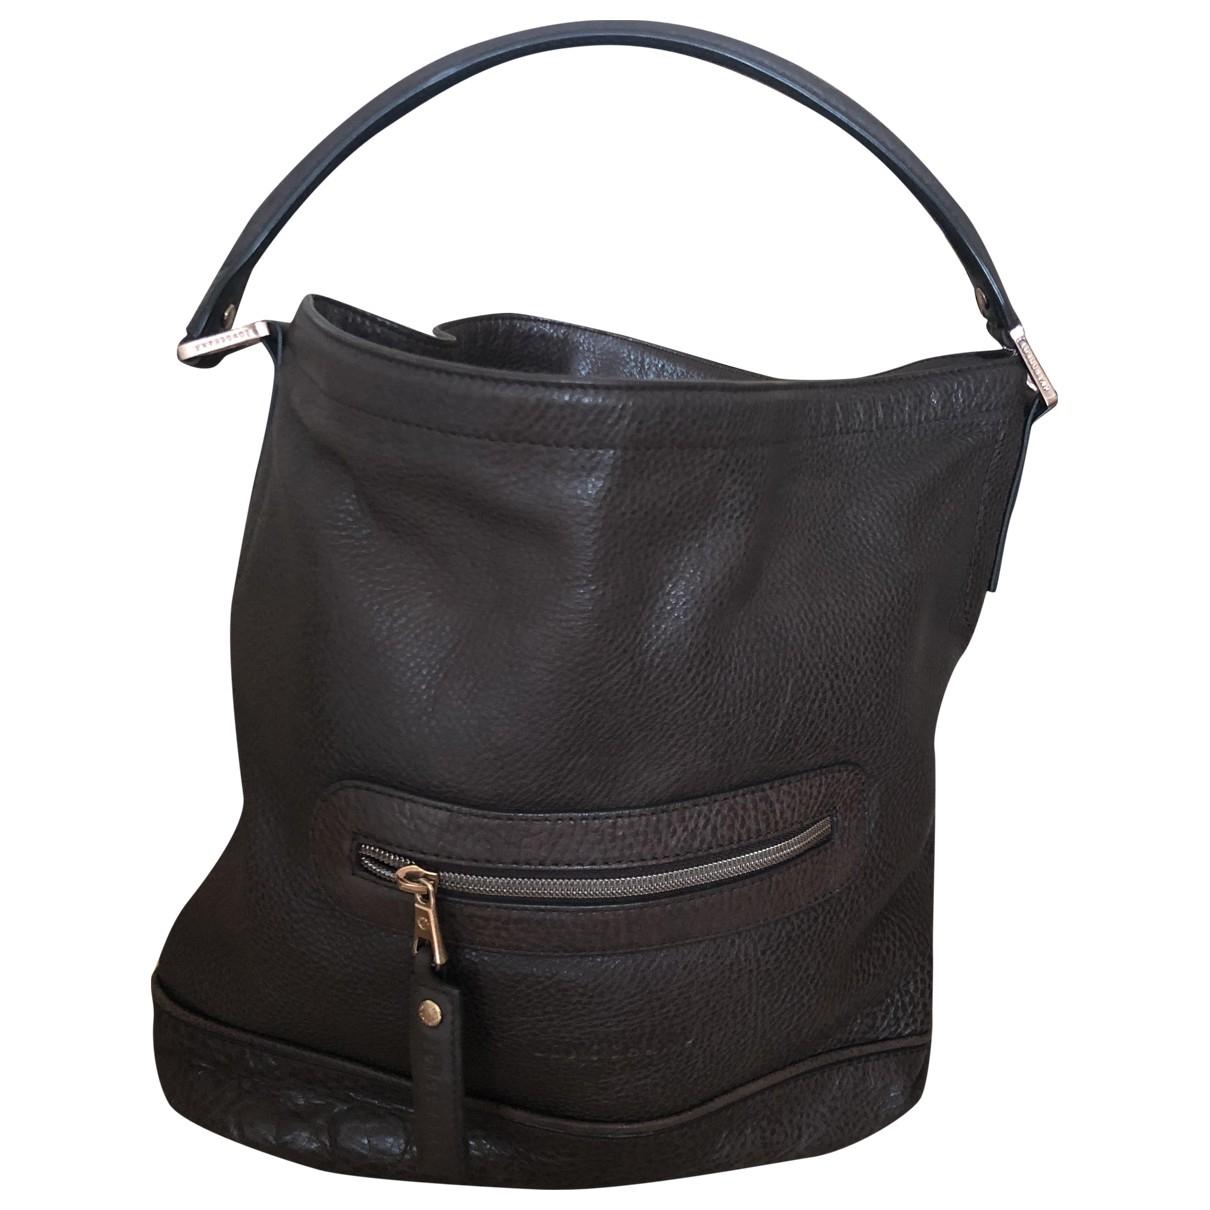 Longchamp N Brown Leather handbag for Women N